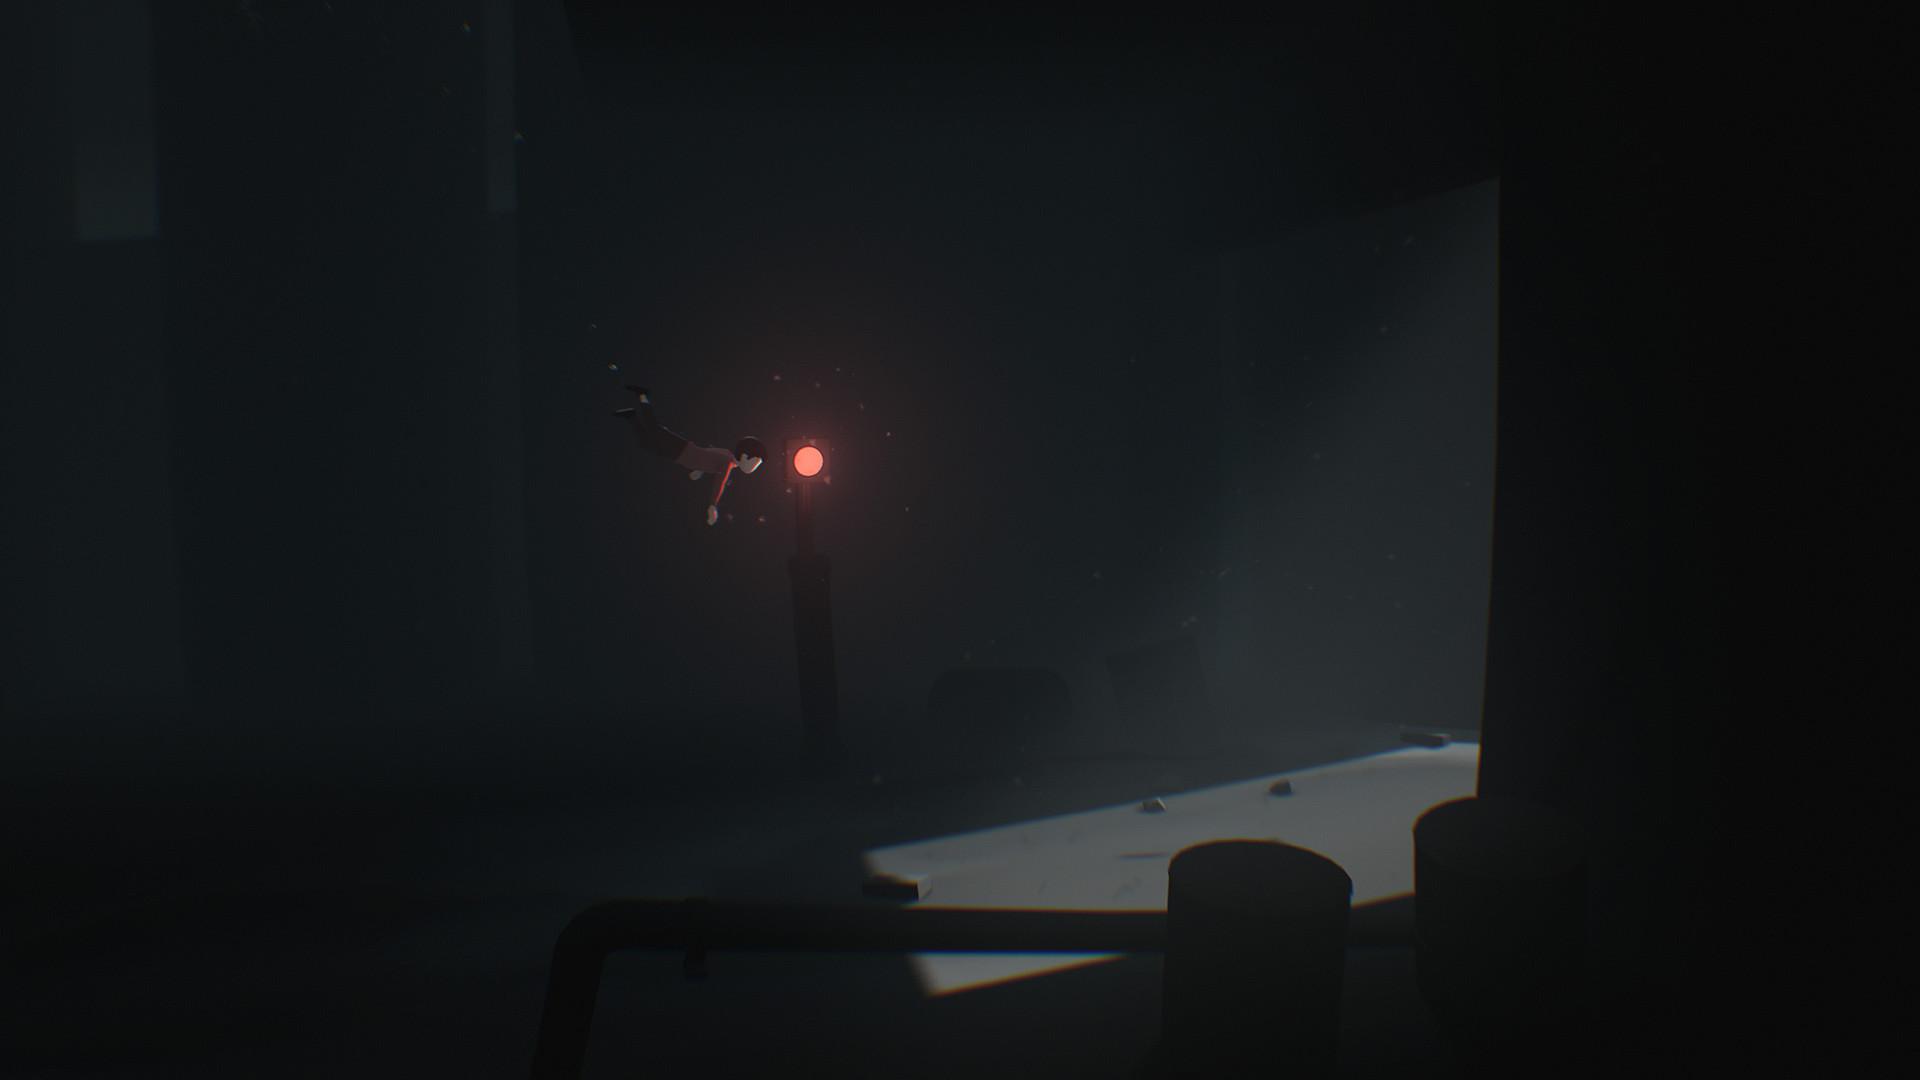 Inside image 3